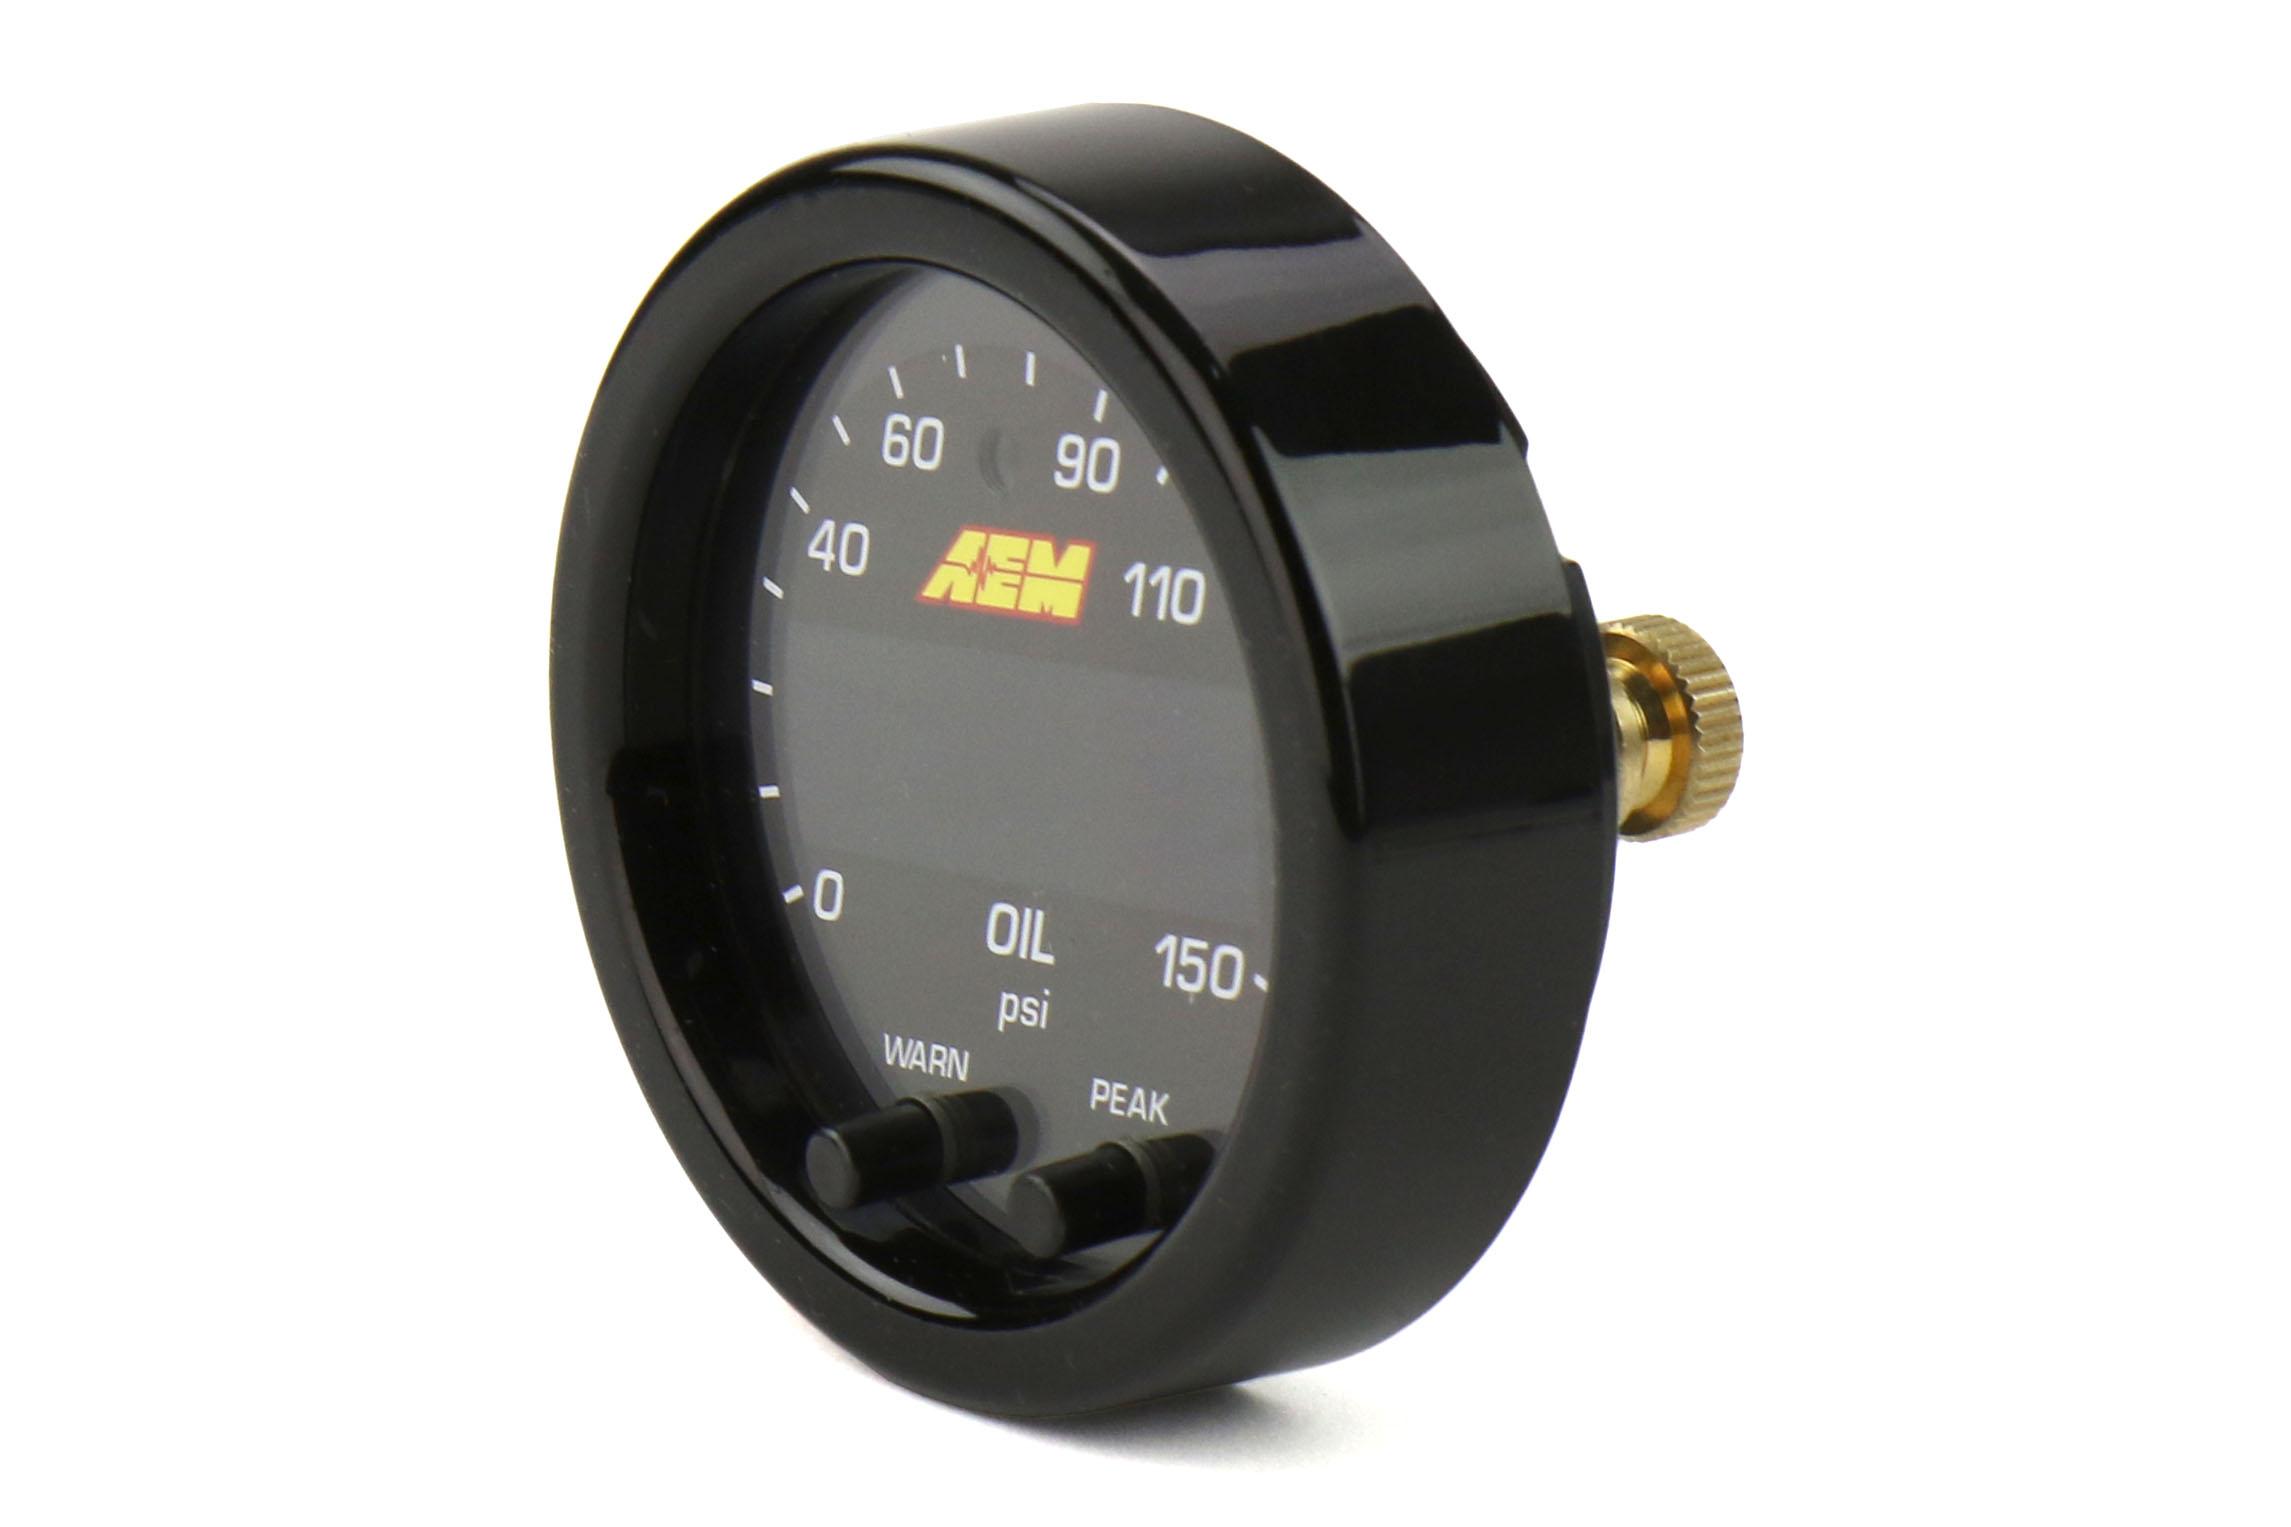 AEM X Series 30-0307 Universal Oil Pressure Gauge 0-150psi 52mm